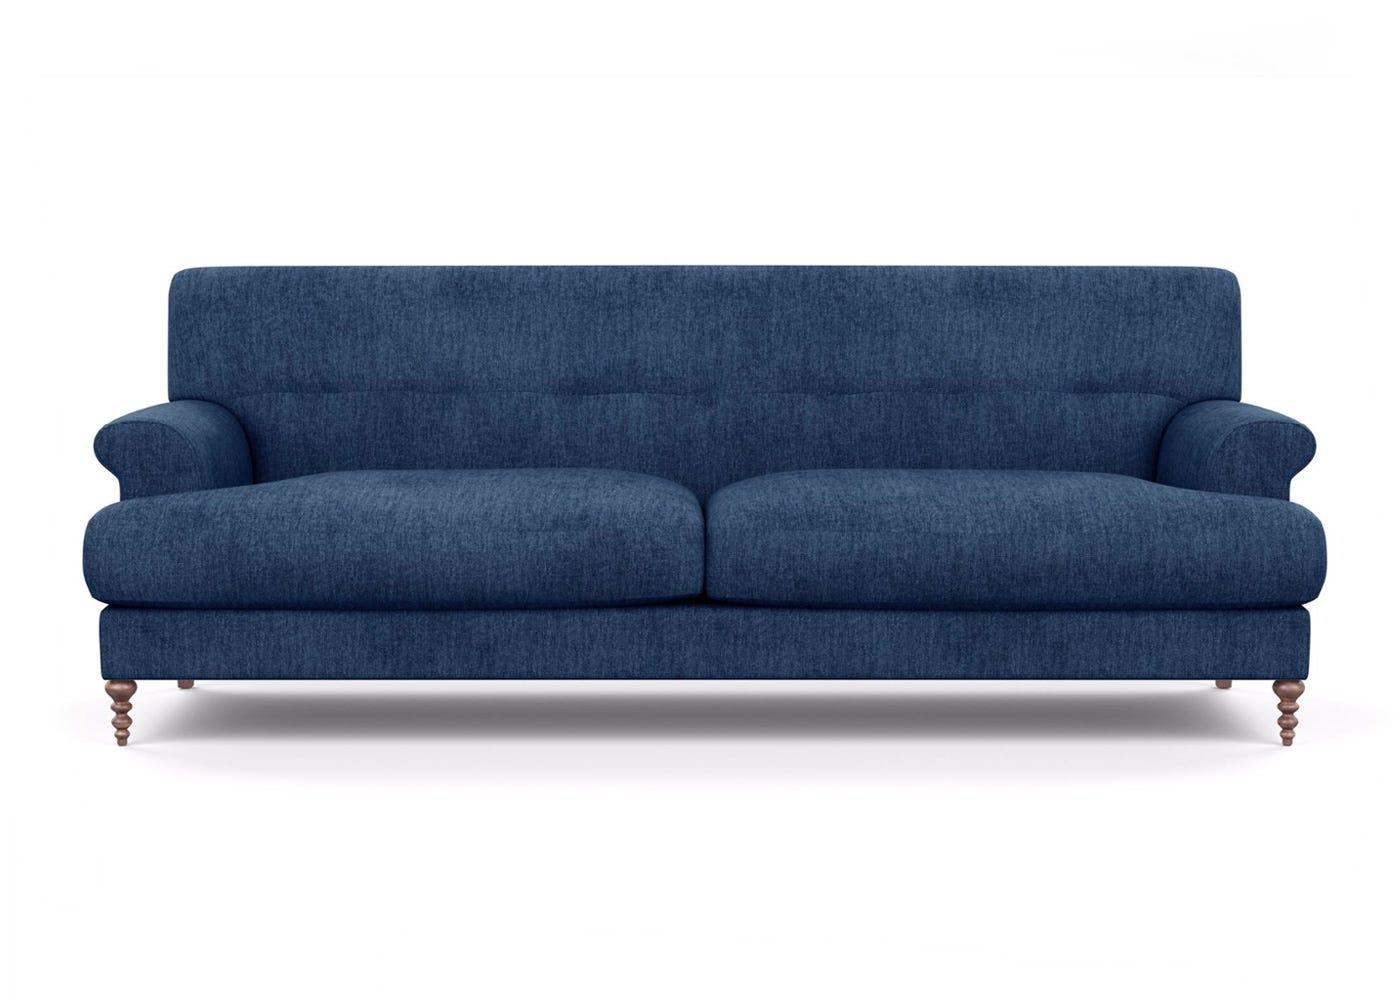 3 Seater Sofa Bed Scp Oscar 3 Seater Sofa